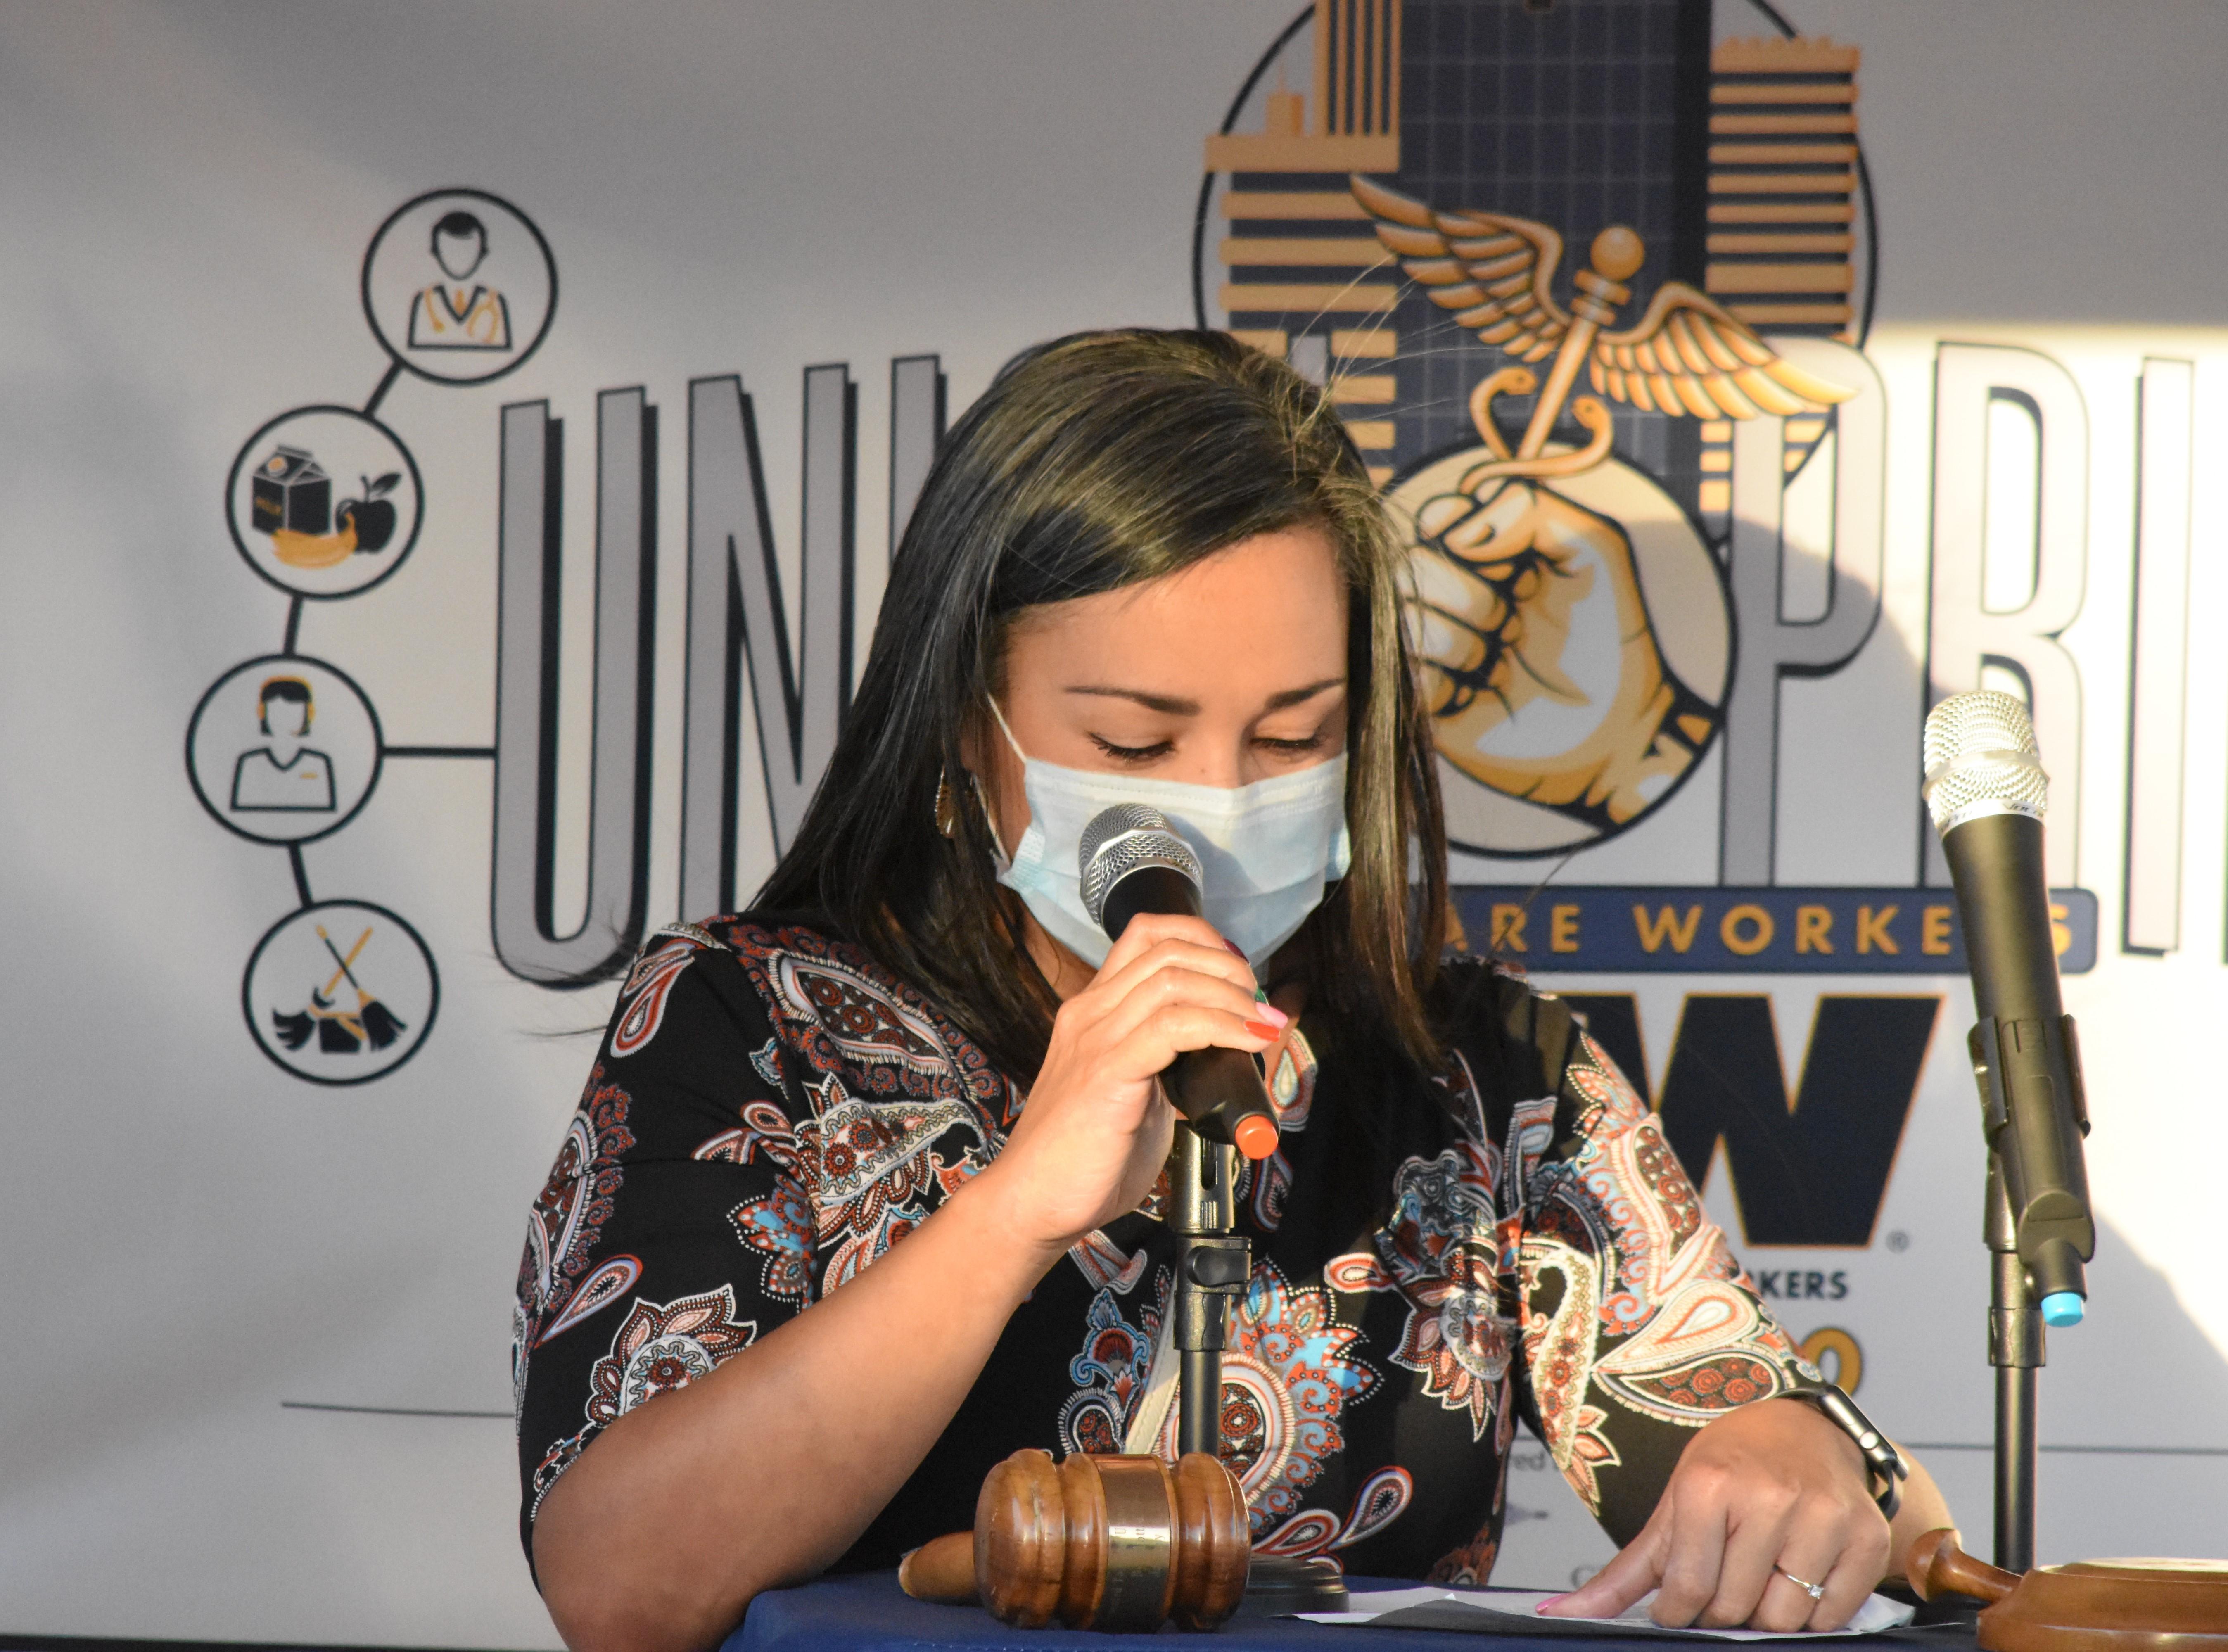 Gabriela Plascencia – Riverside Councilwoman Ward 5 Delivers a Moving Speech